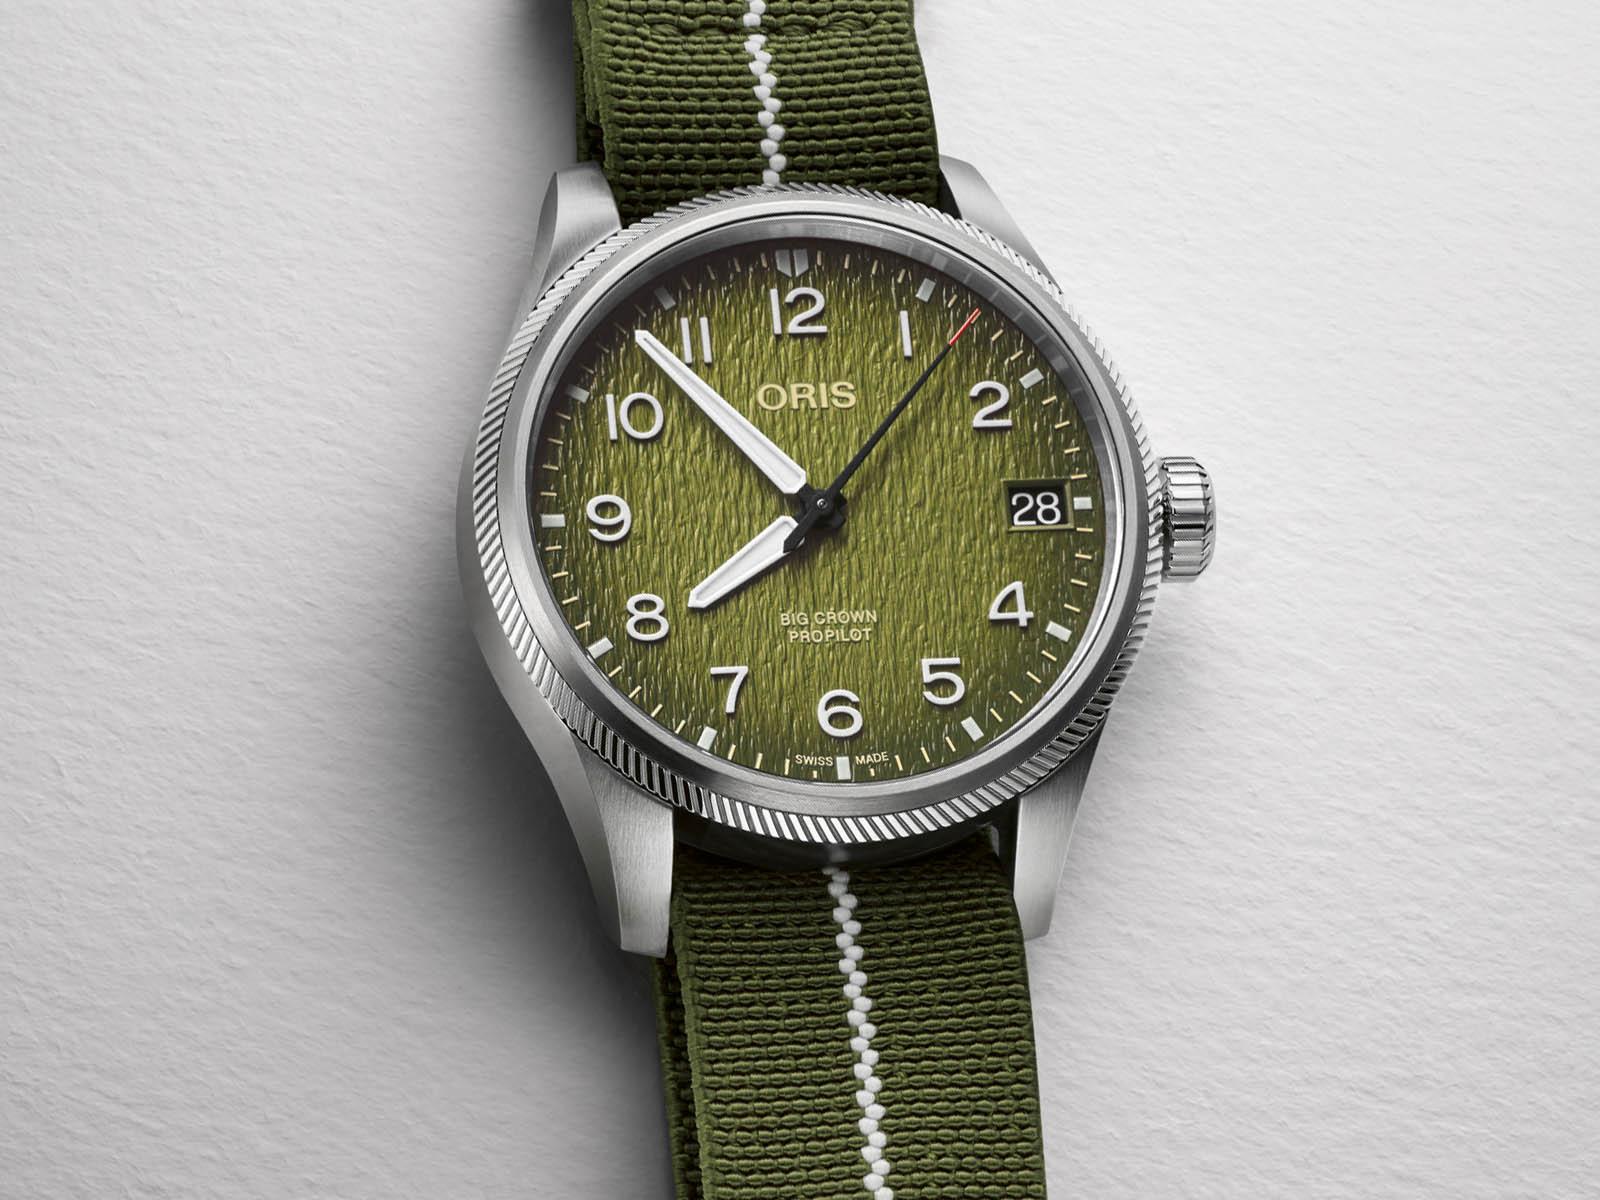 01-751-7761-4187-set-oris-big-crown-propilot-okavango-air-rescue-limited-edition-6.jpg